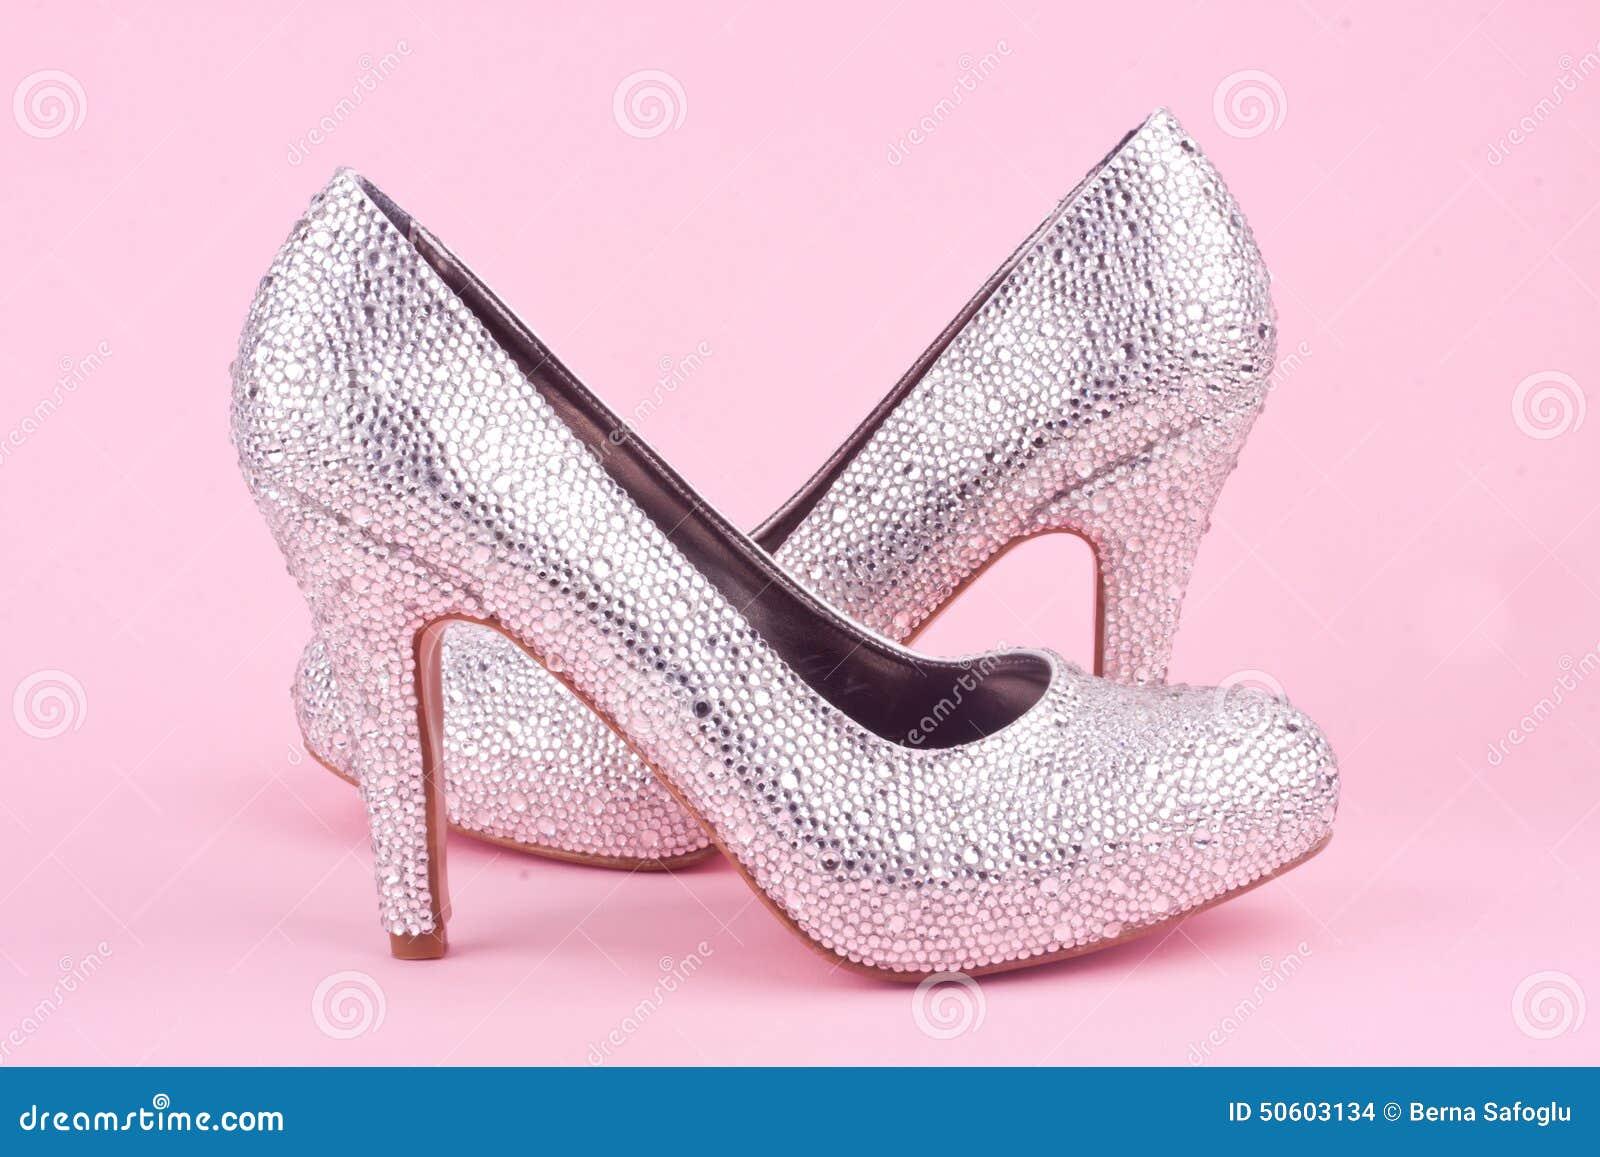 Pink High Heels With Rhinestones